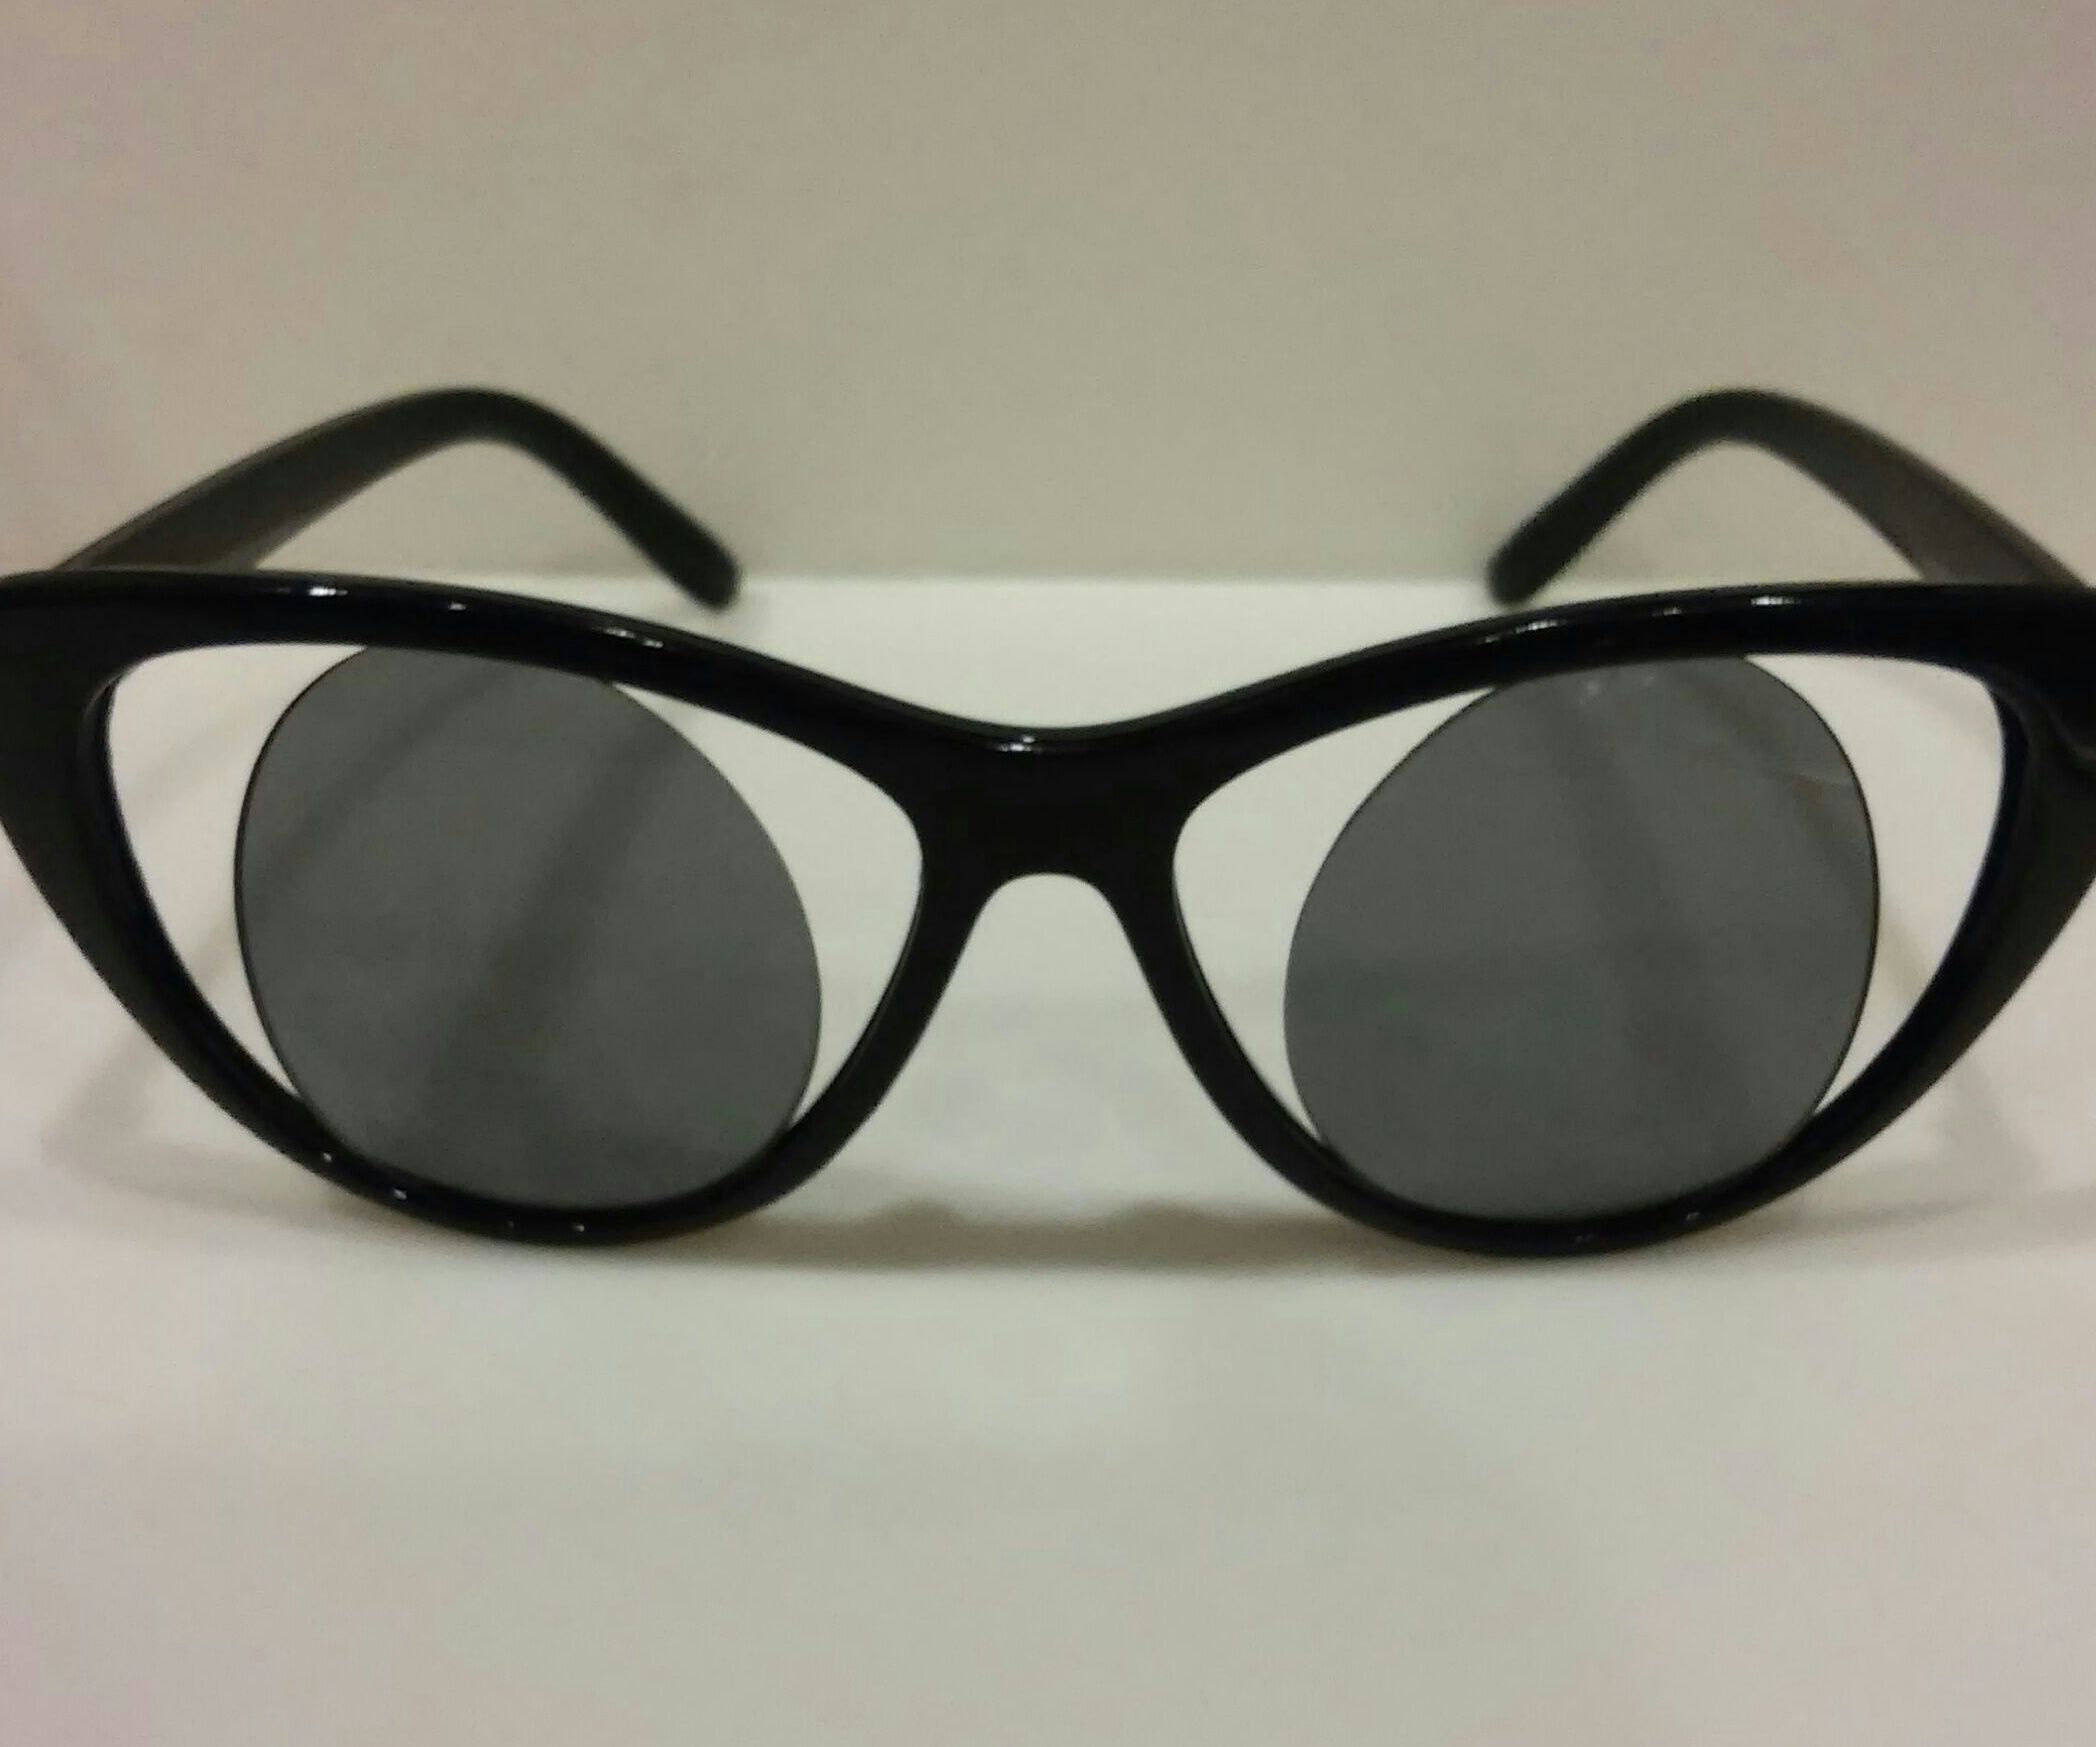 $2.00 Super Andy Warhol Nicolou Inspired Sunglasses